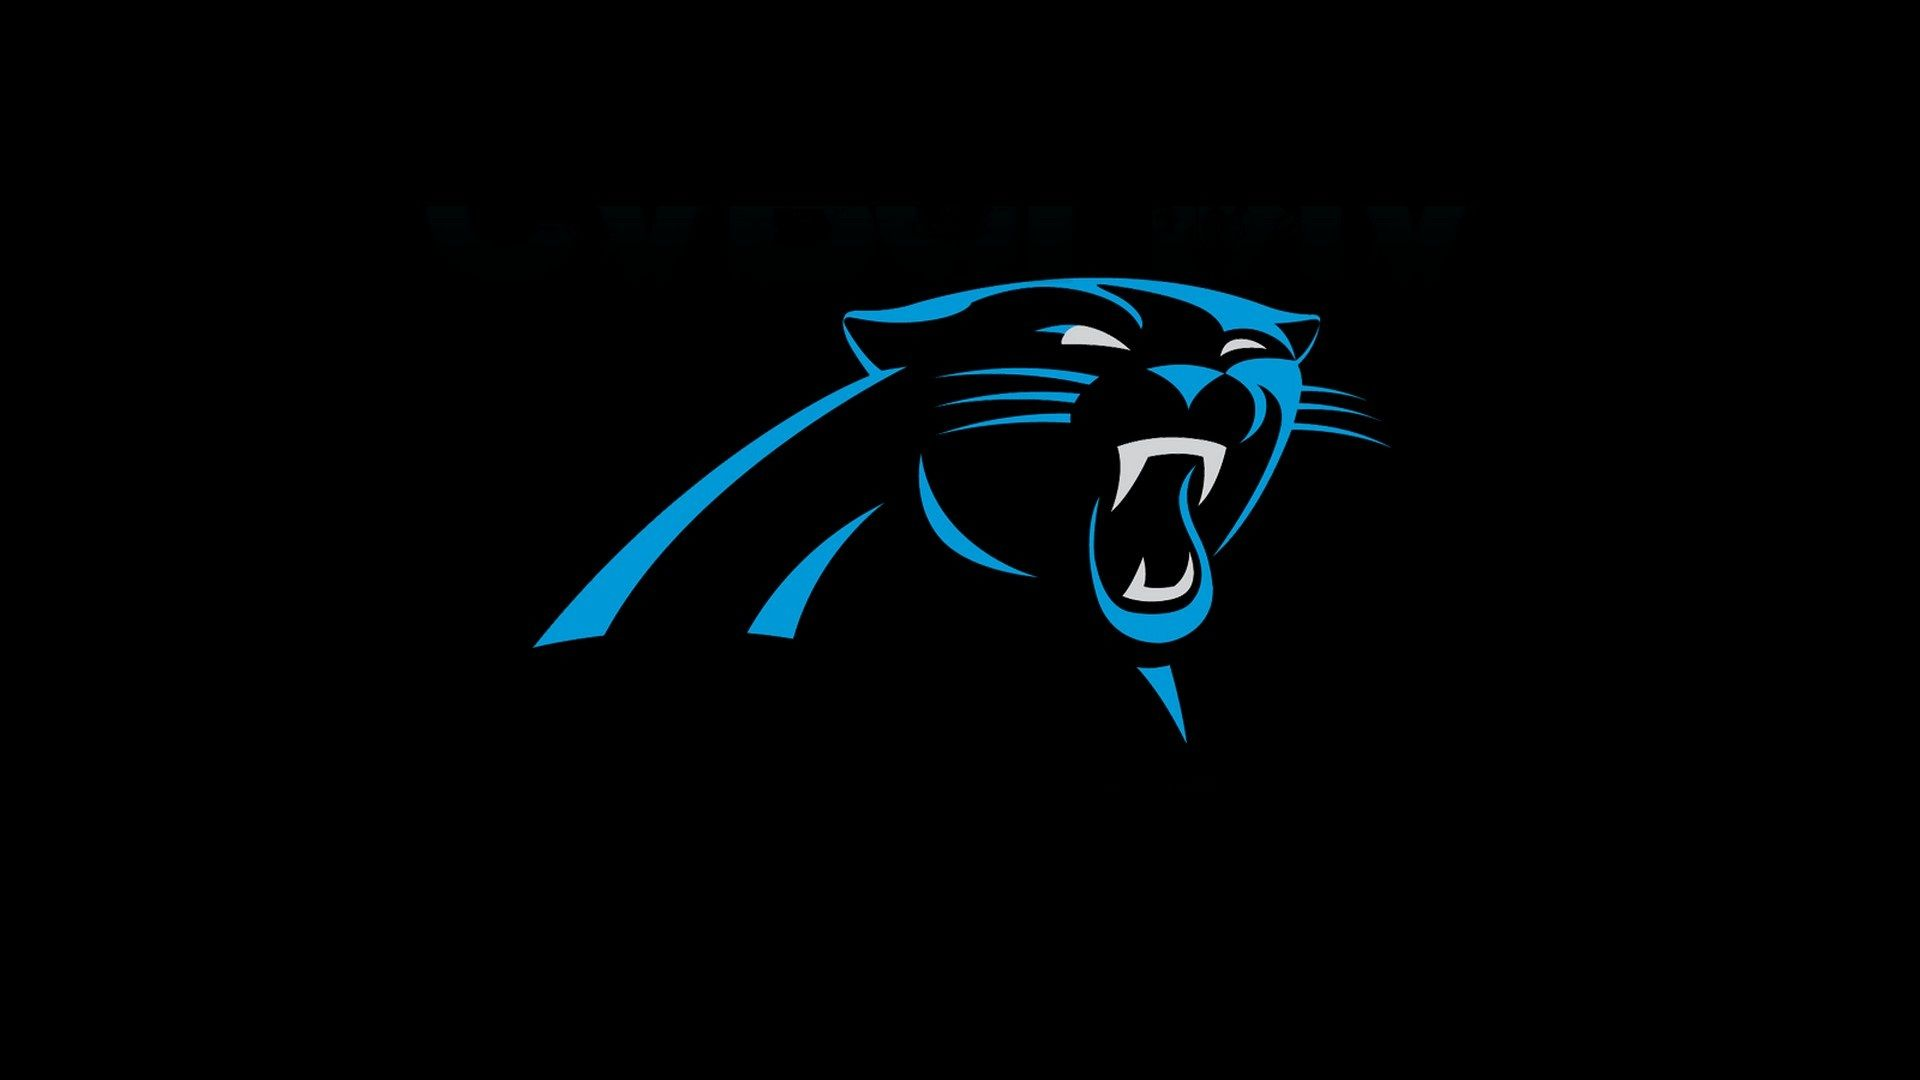 Carolina Panthers Wallpaper Hd